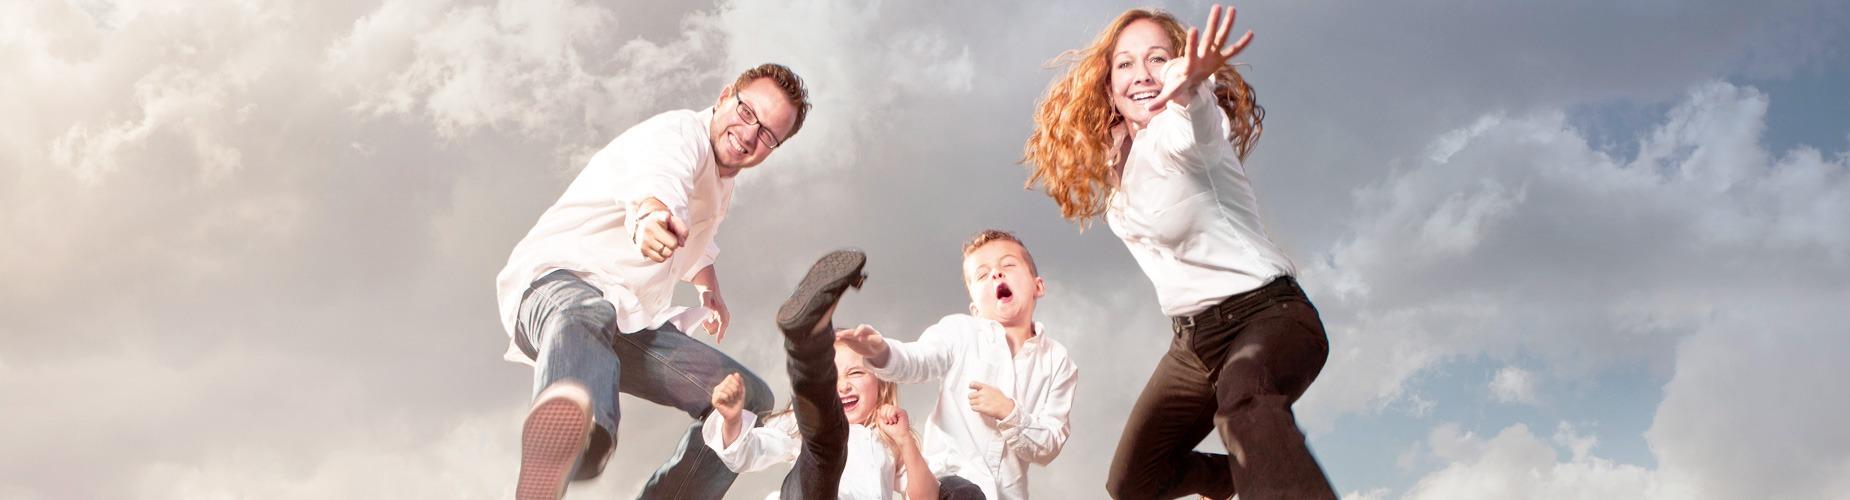 Family Karate Discount in Gilbert & Chandler